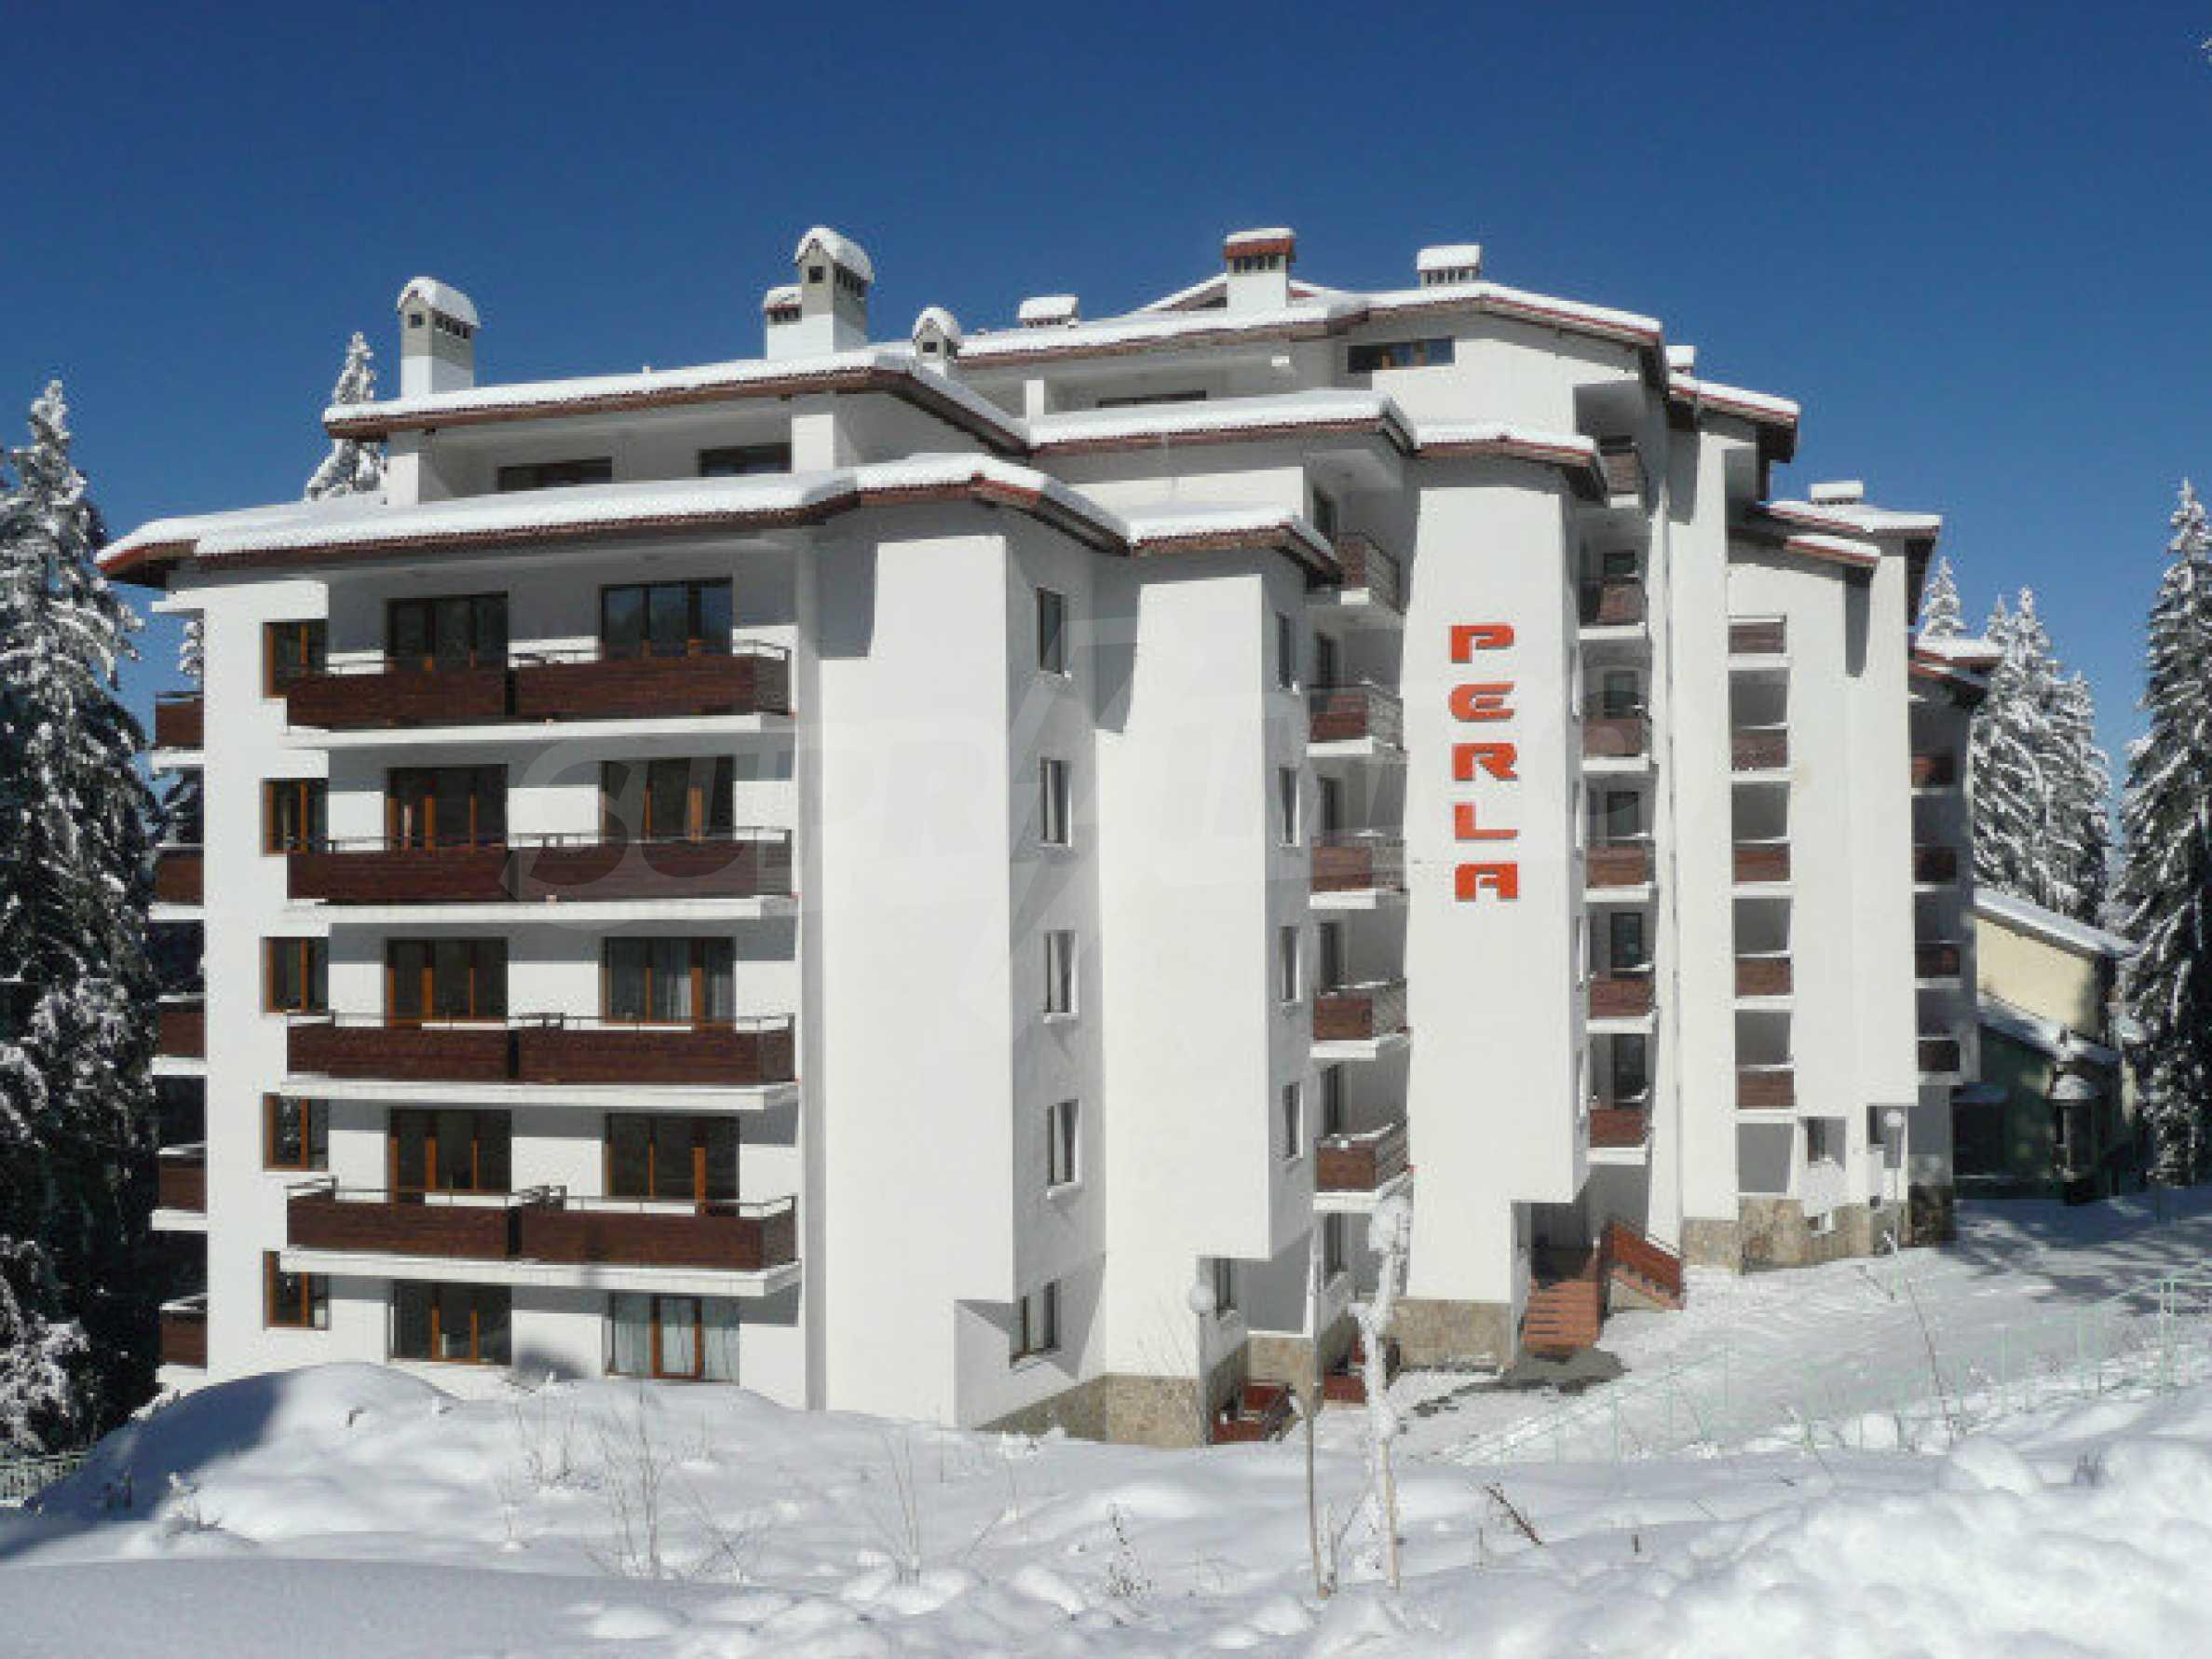 Cozy apartment near the ski slopes of Pamporovo 10